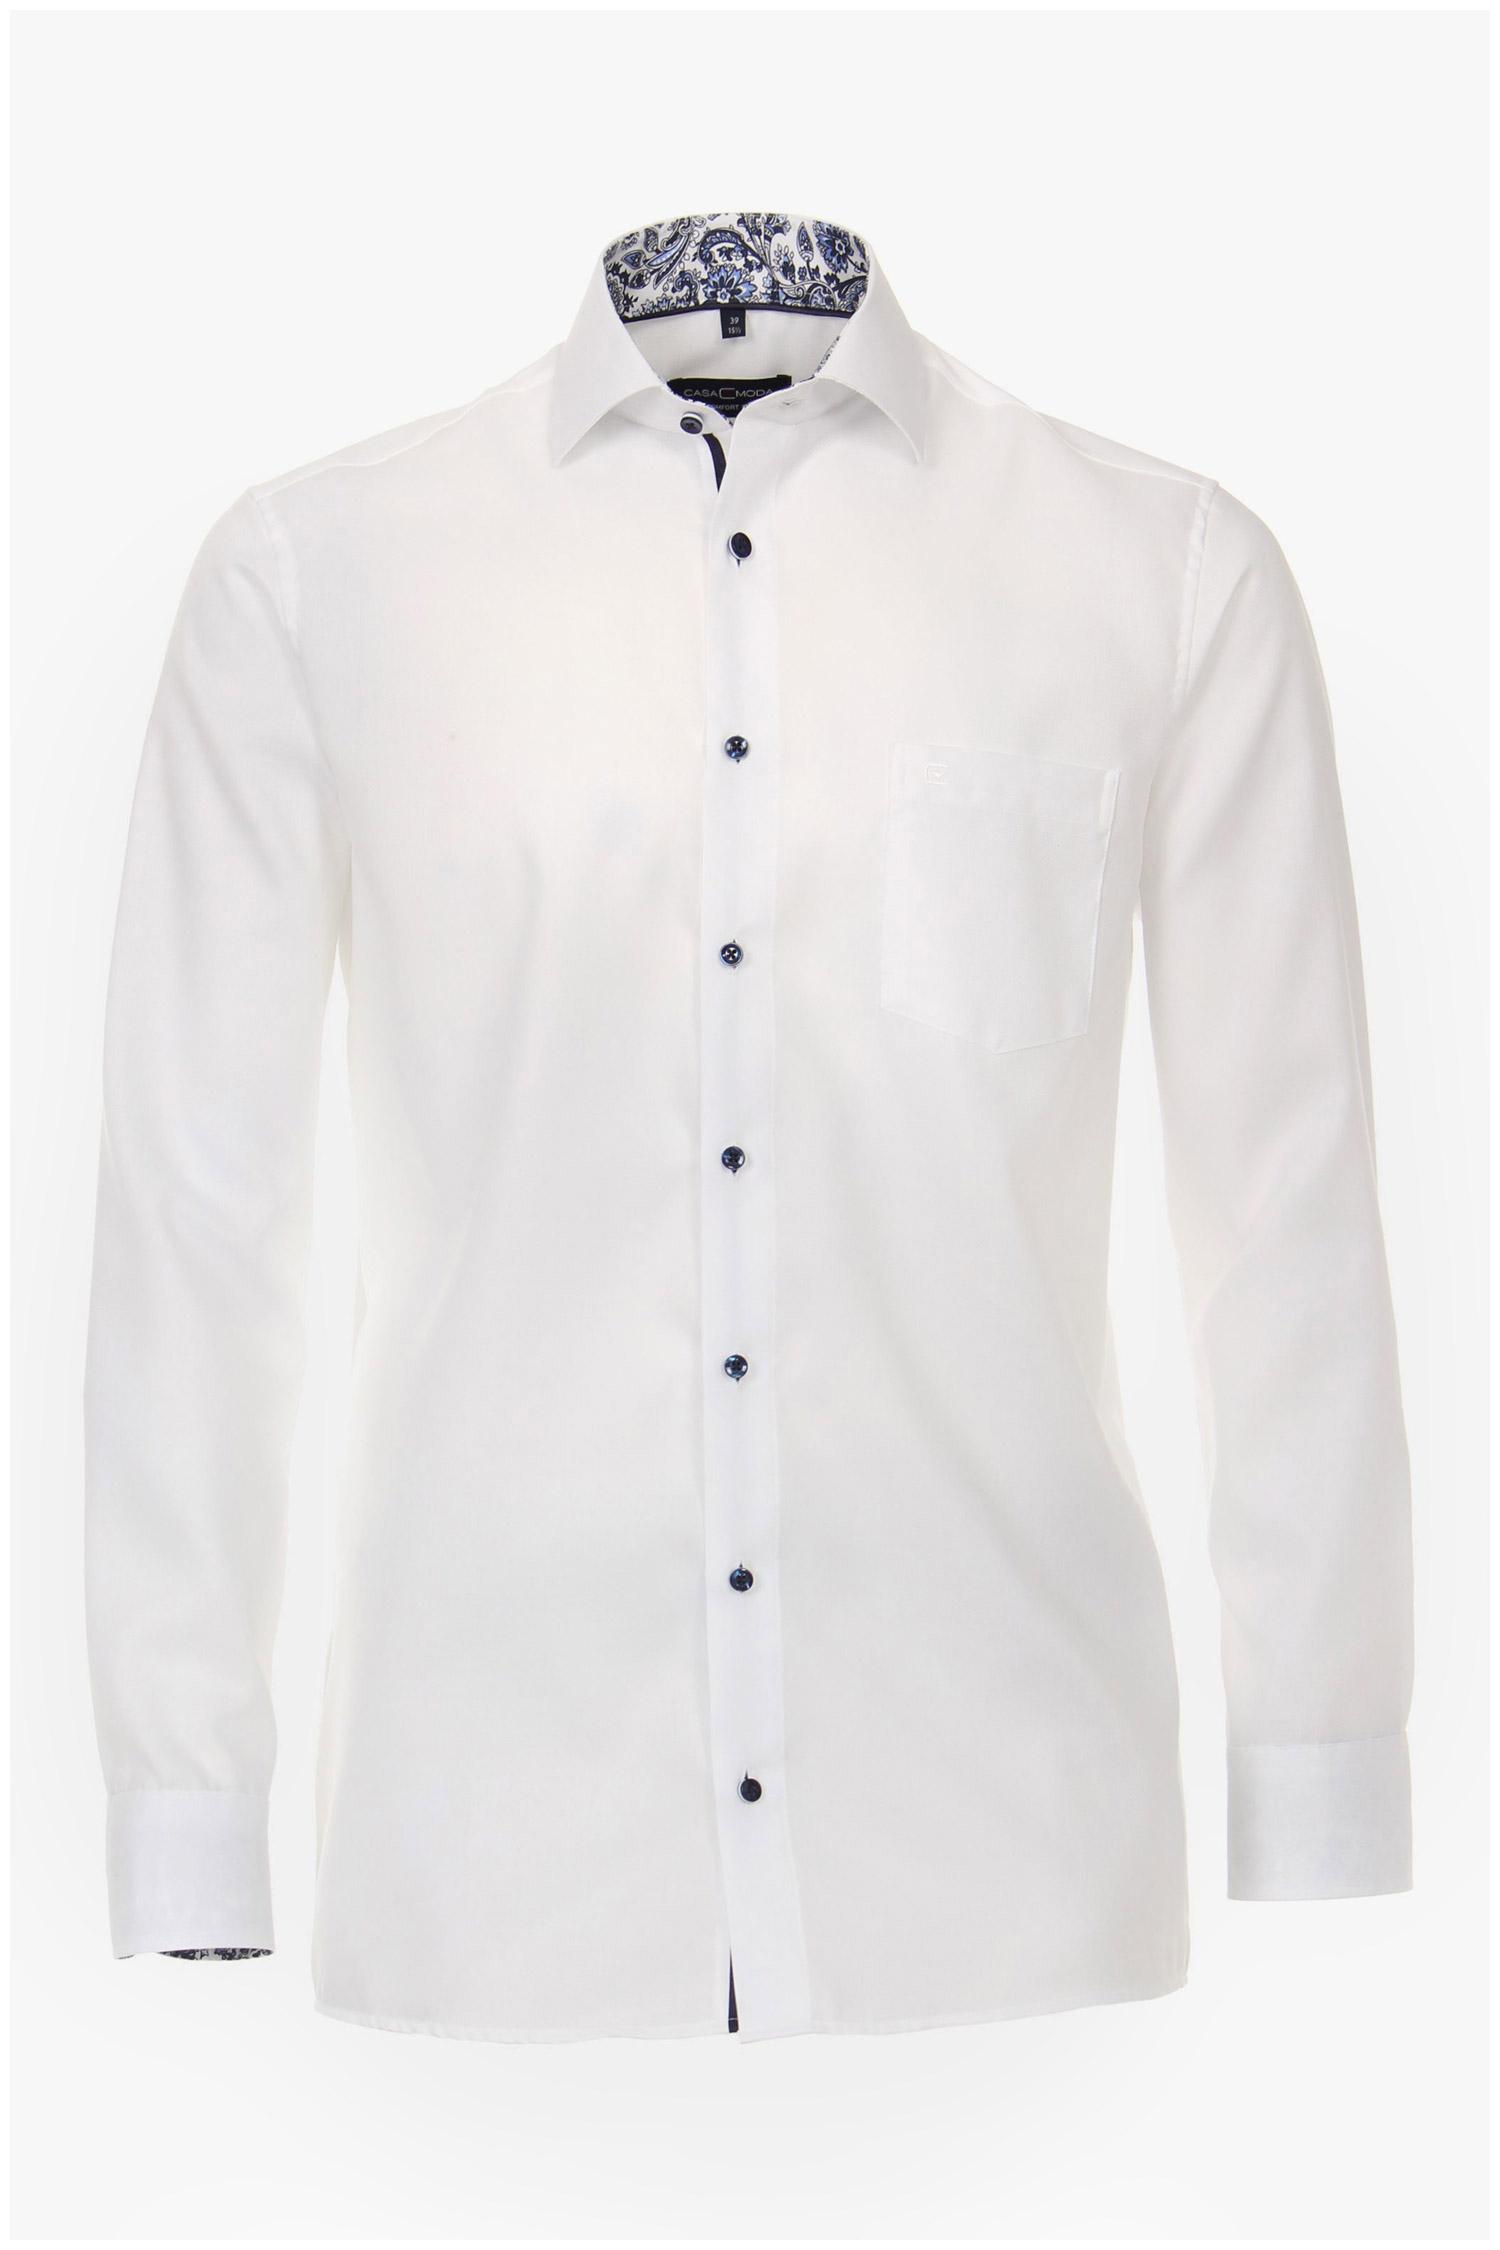 Camisas, Vestir Manga Larga, 110243, BLANCO | Zoom